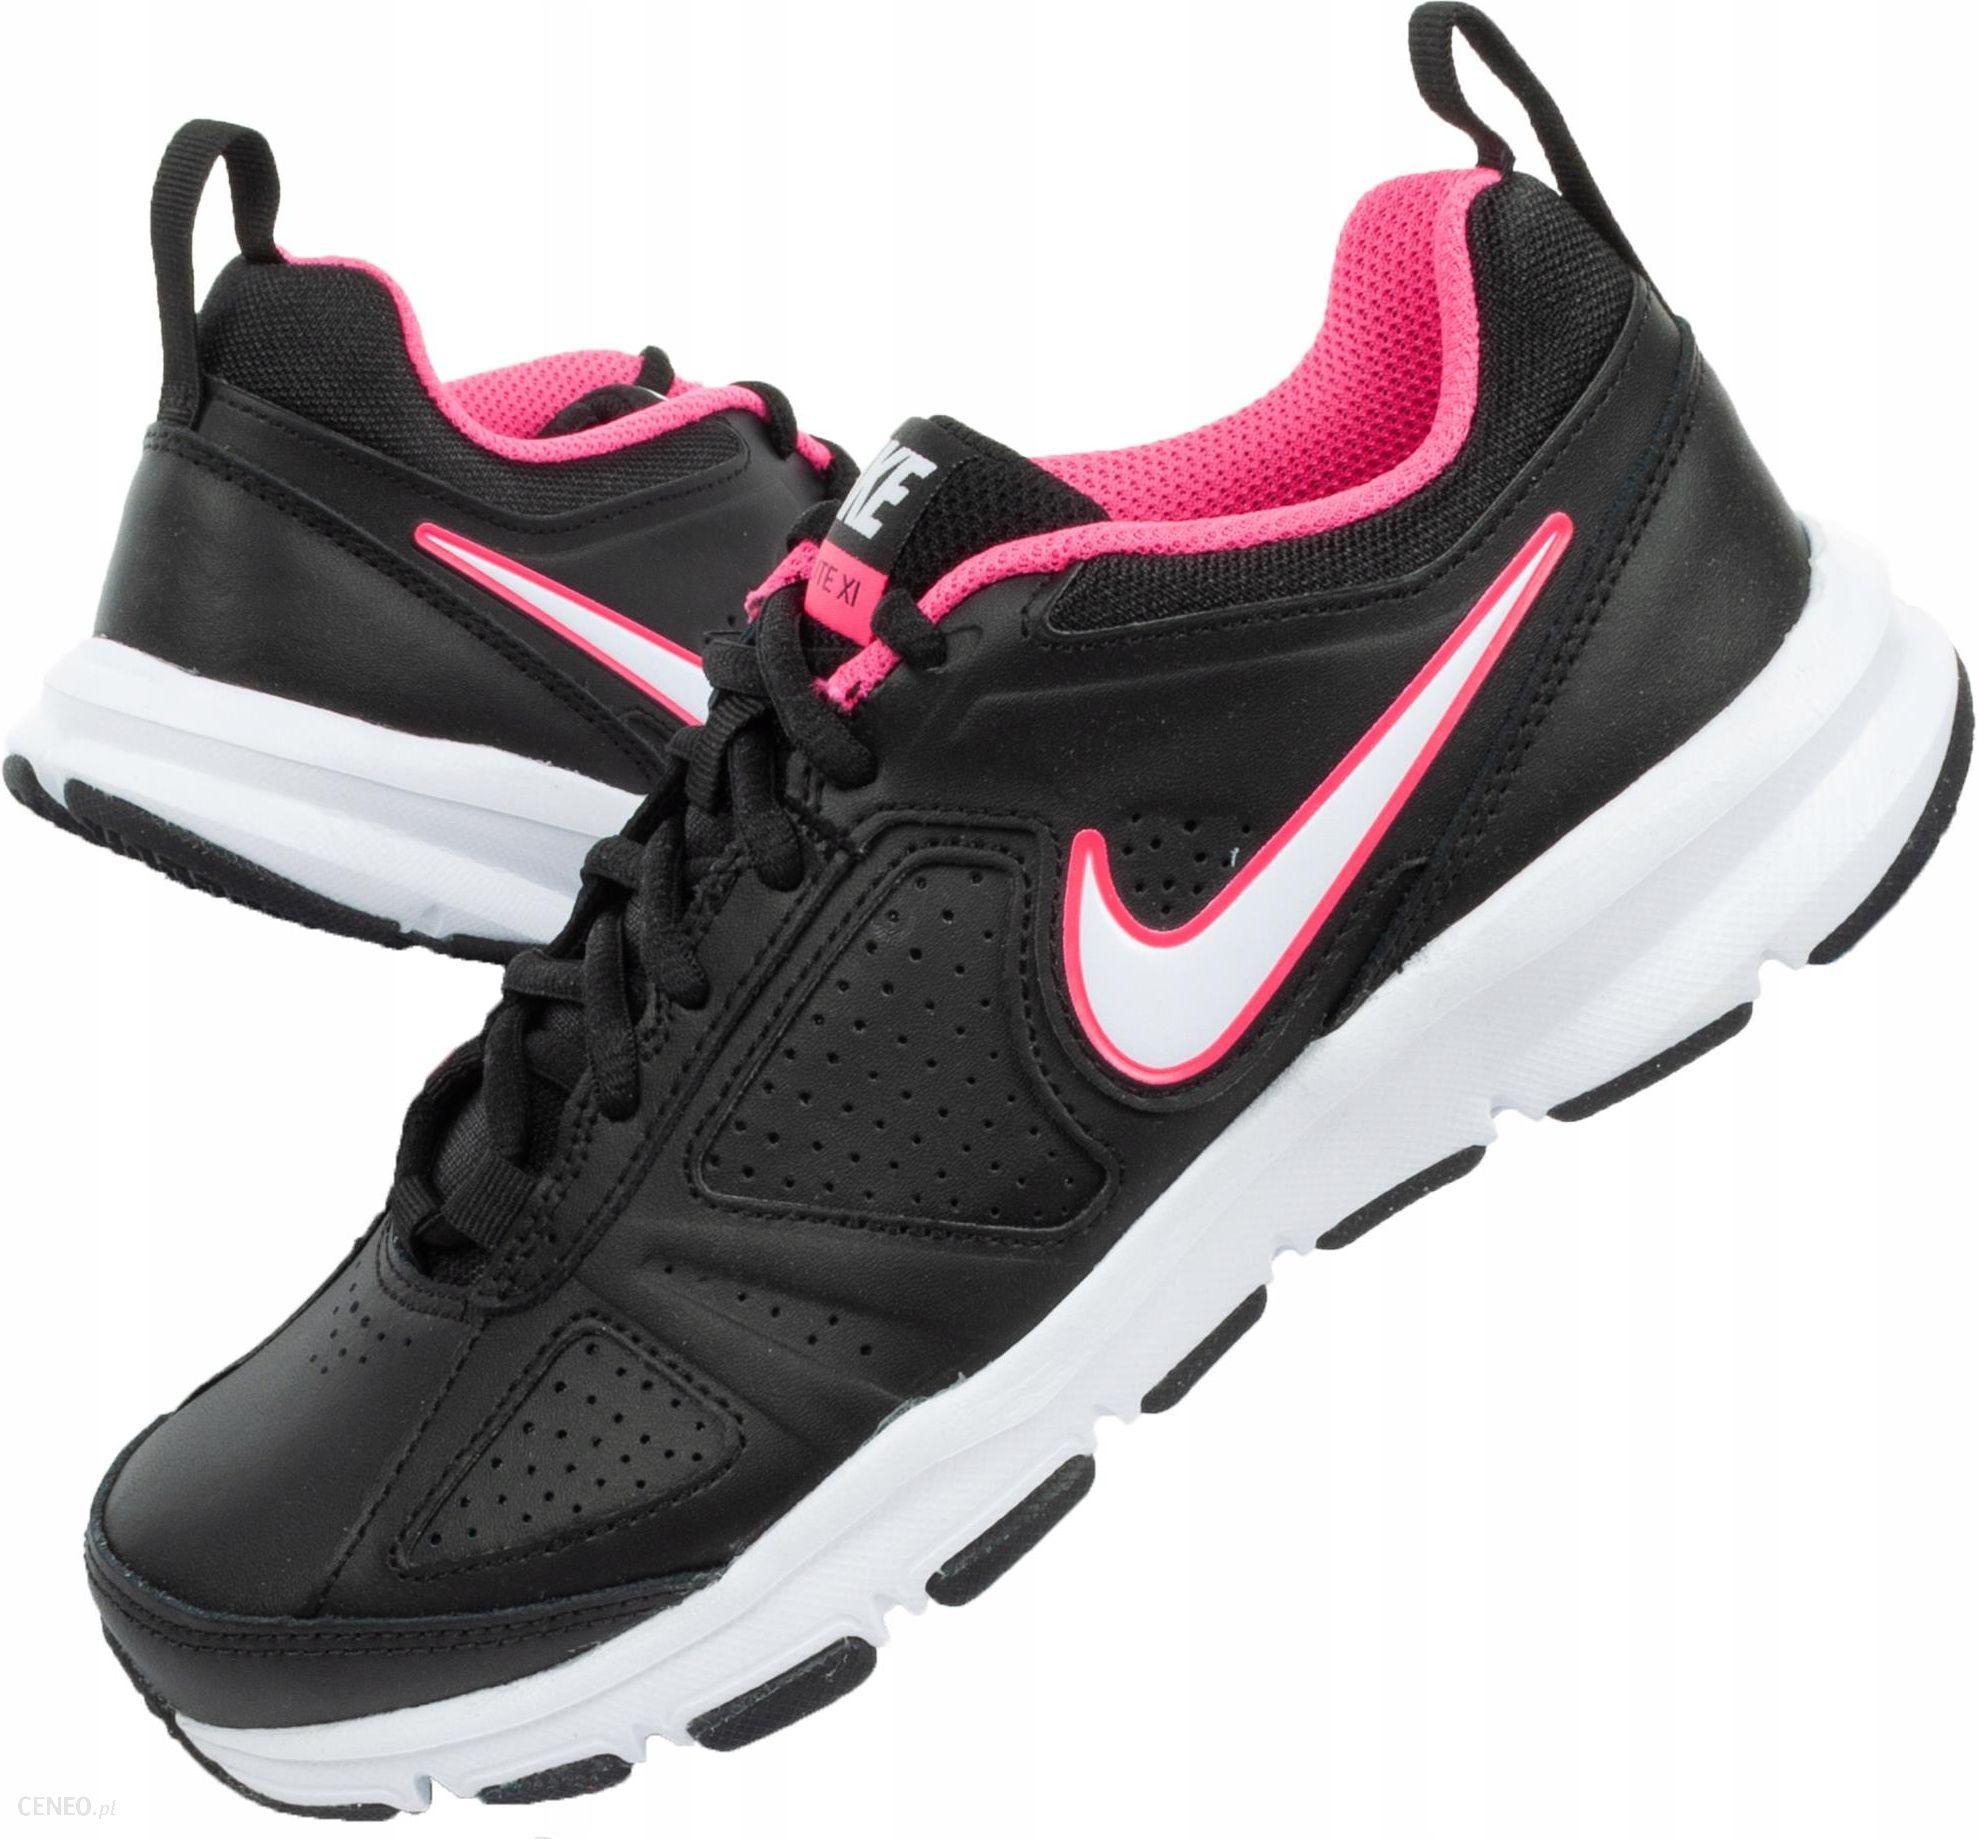 1a7a119b4db99 Buty Damskie Nike T-lite XI  616696 016  r.41 - Ceny i opinie - Ceneo.pl